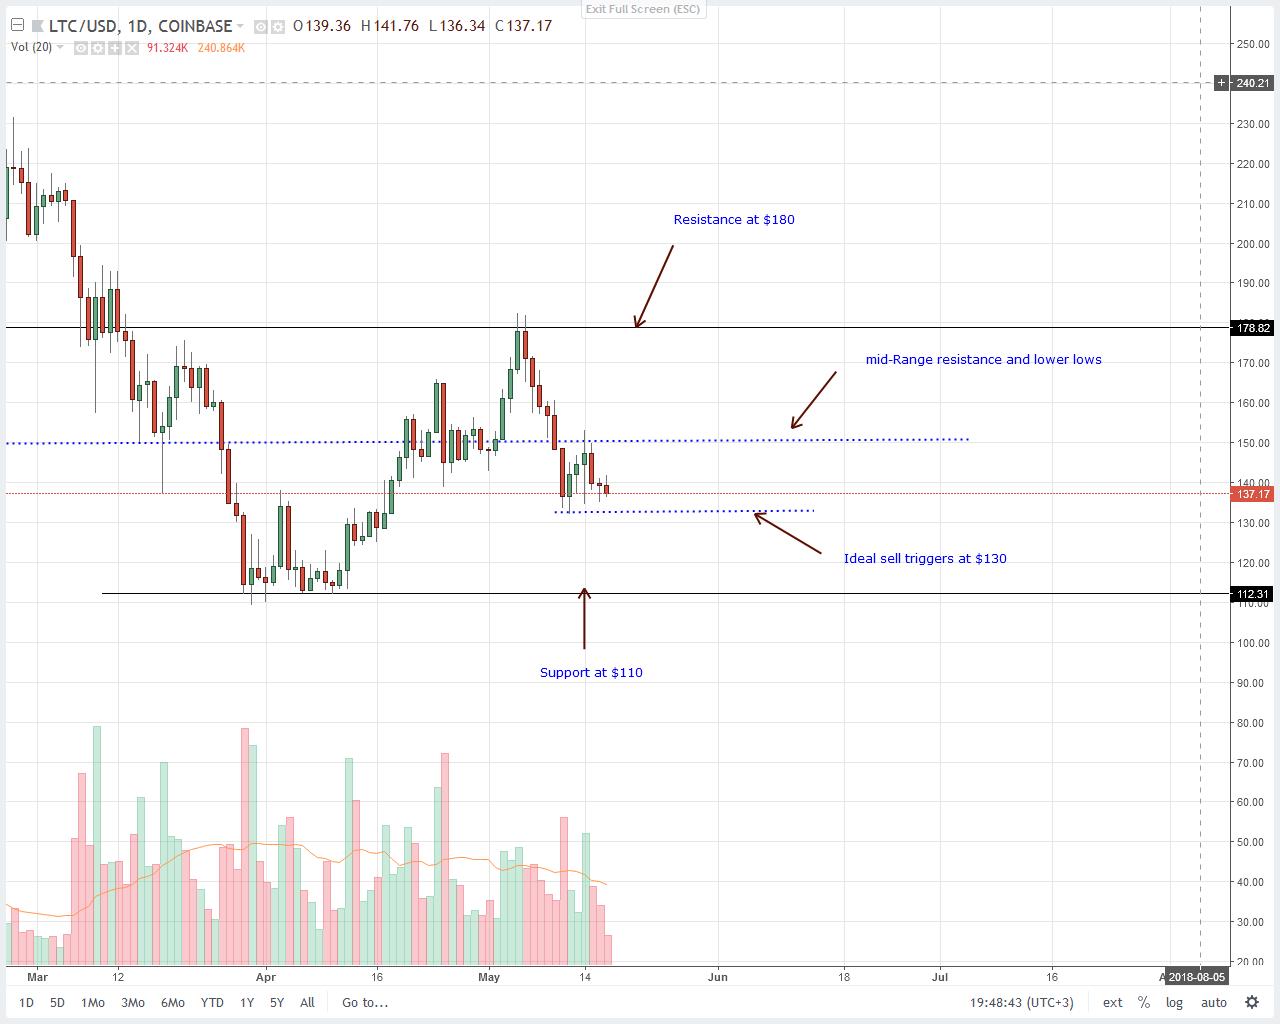 Litecoin (LTC) Technical Price Analysis